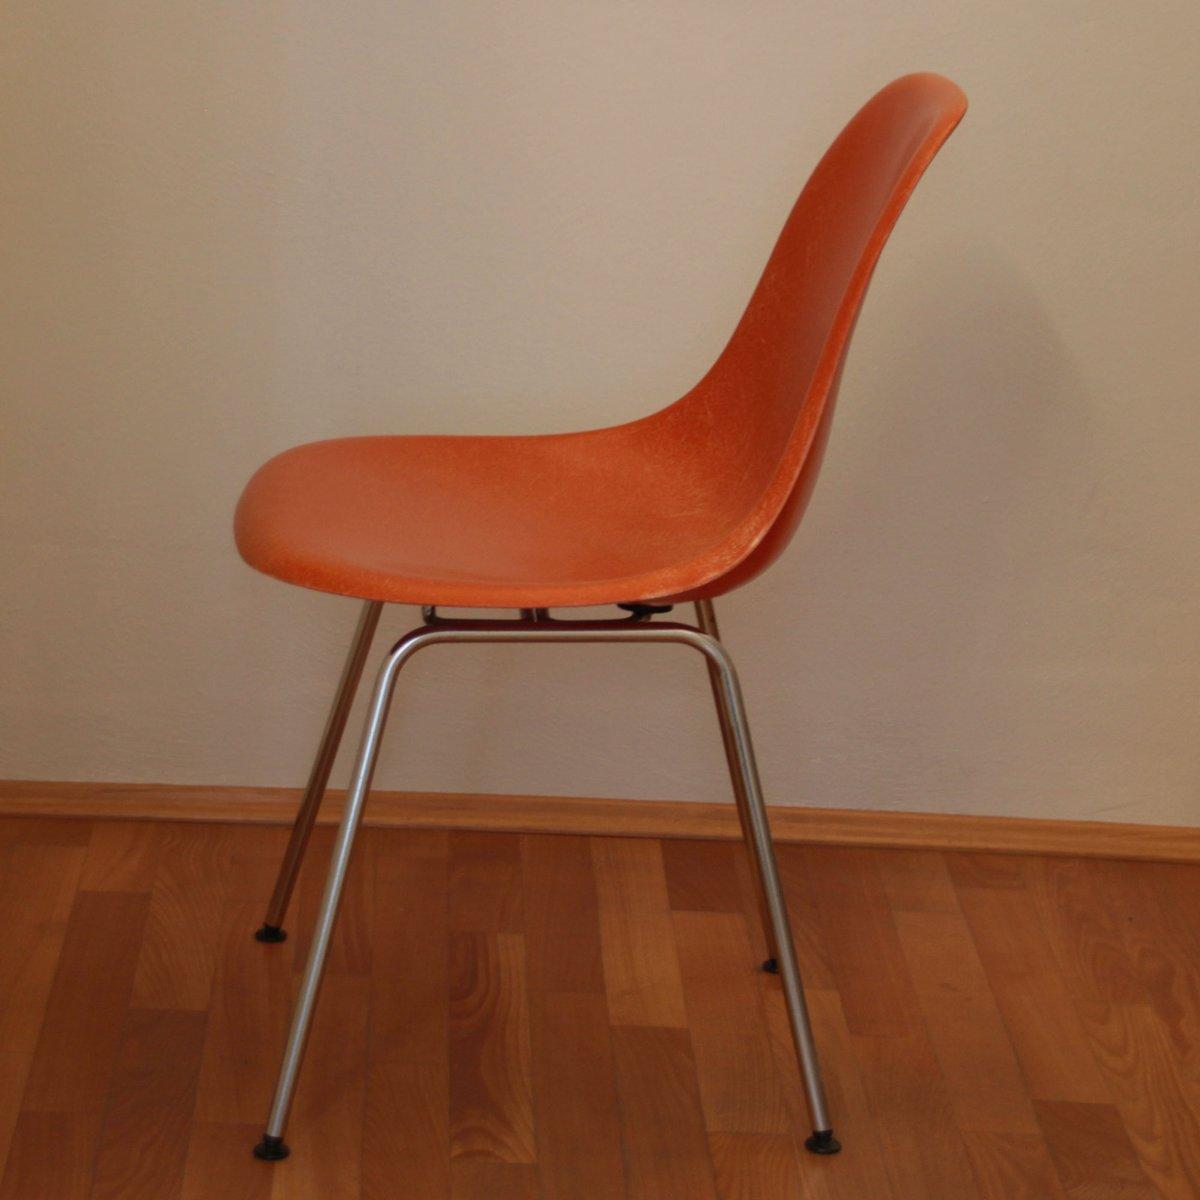 korallenroter stuhl von charles ray eames f r herman miller bei pamono kaufen. Black Bedroom Furniture Sets. Home Design Ideas